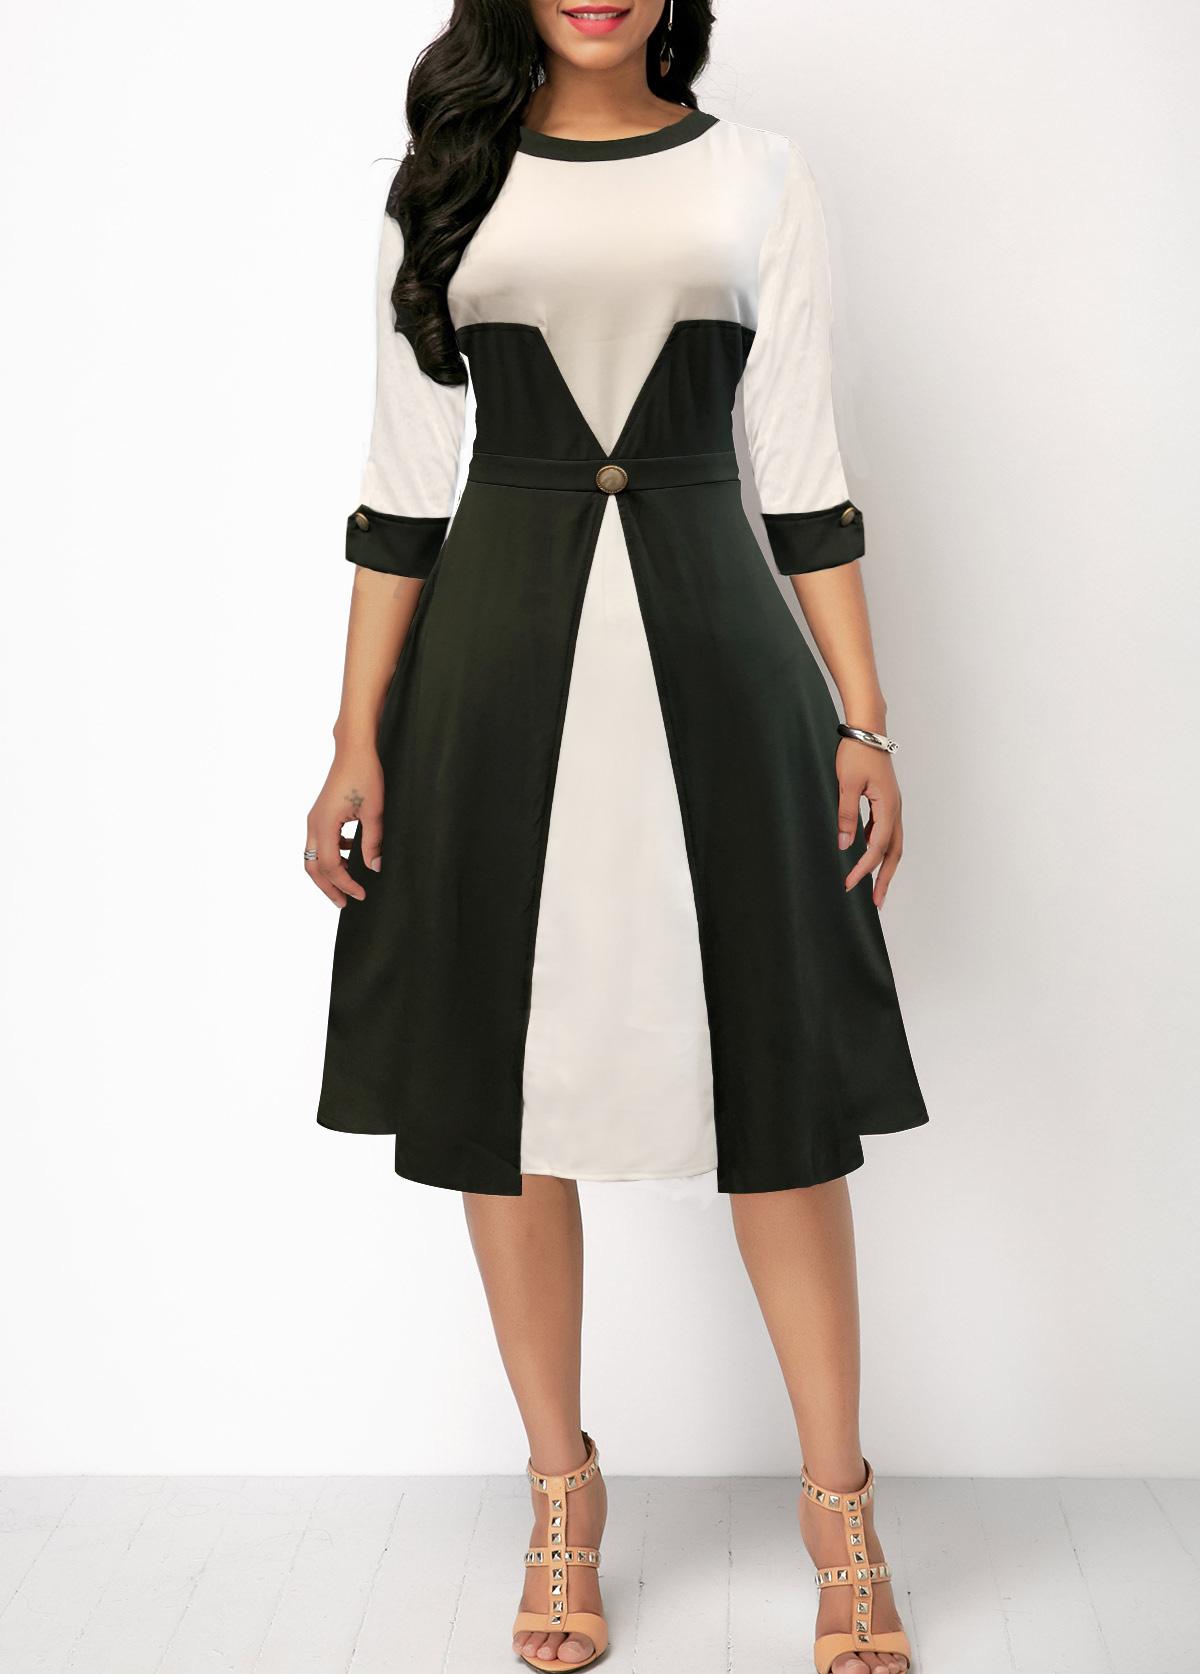 High Waist Color Block Three Quarter Sleeve Dress